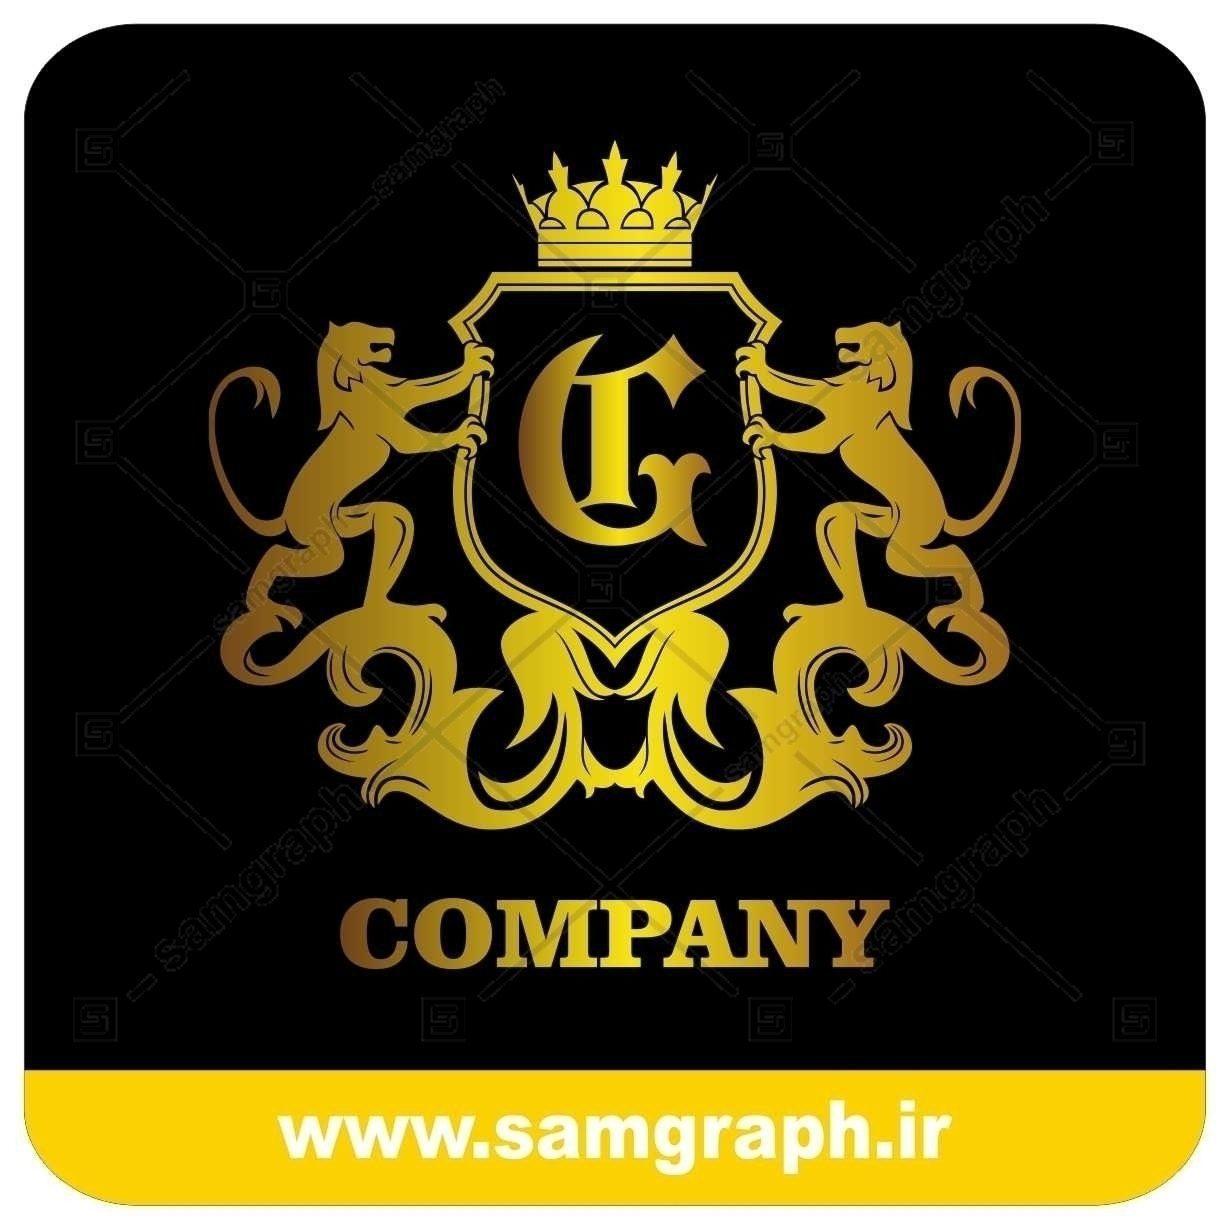 لوگو آماده لاکچری حرف G لاتین - Logo Luxury Sample